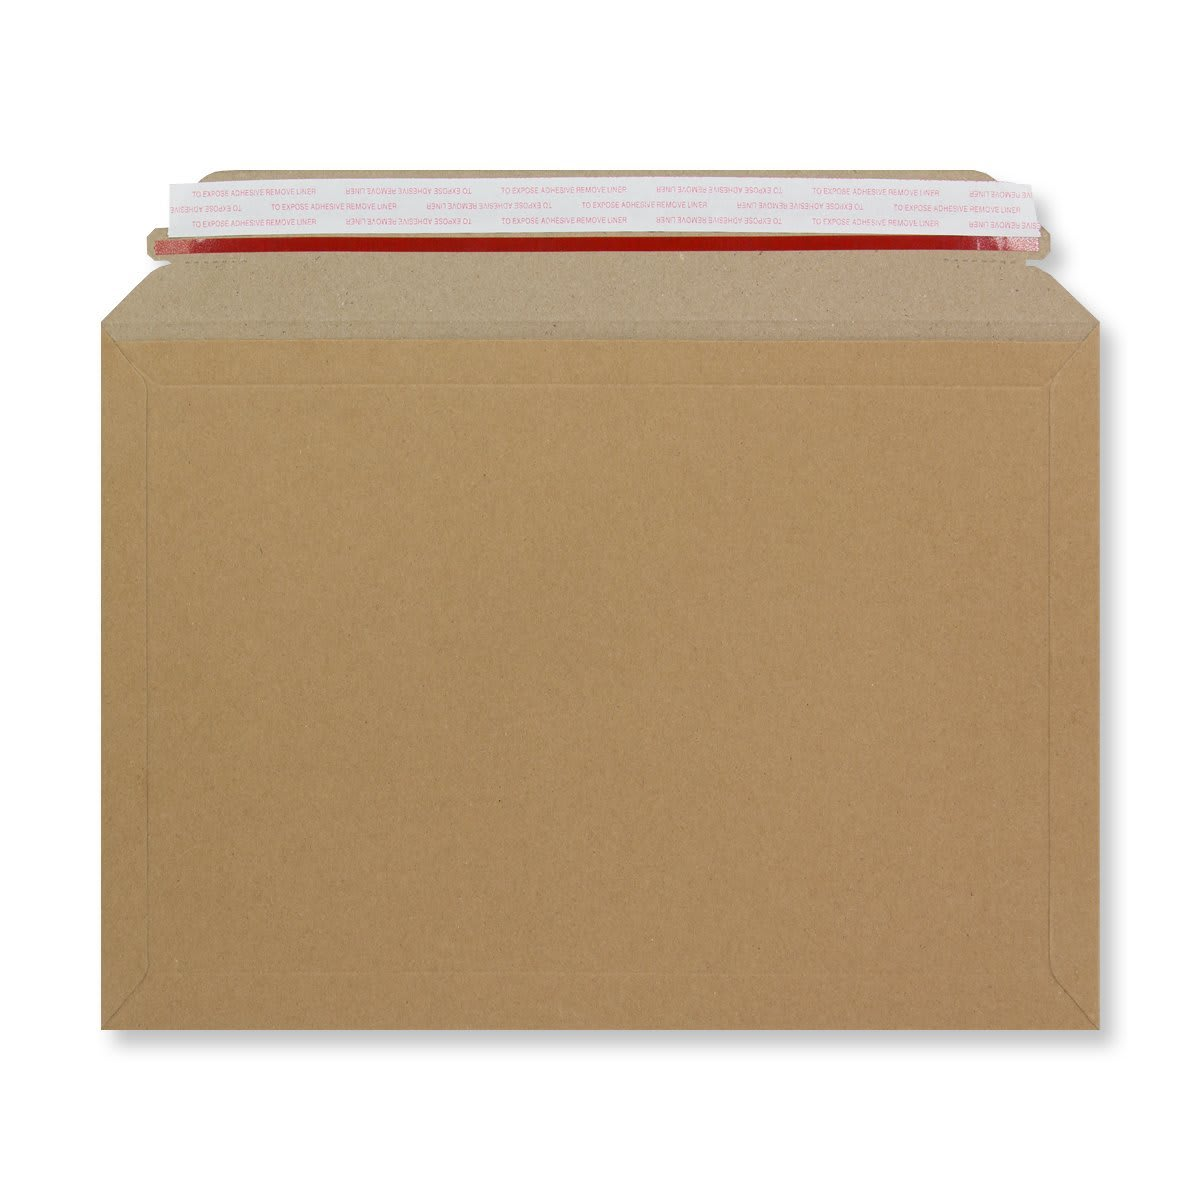 MANILLA CAPACITY BOOK MAILER 234 X 334MM (300gsm)